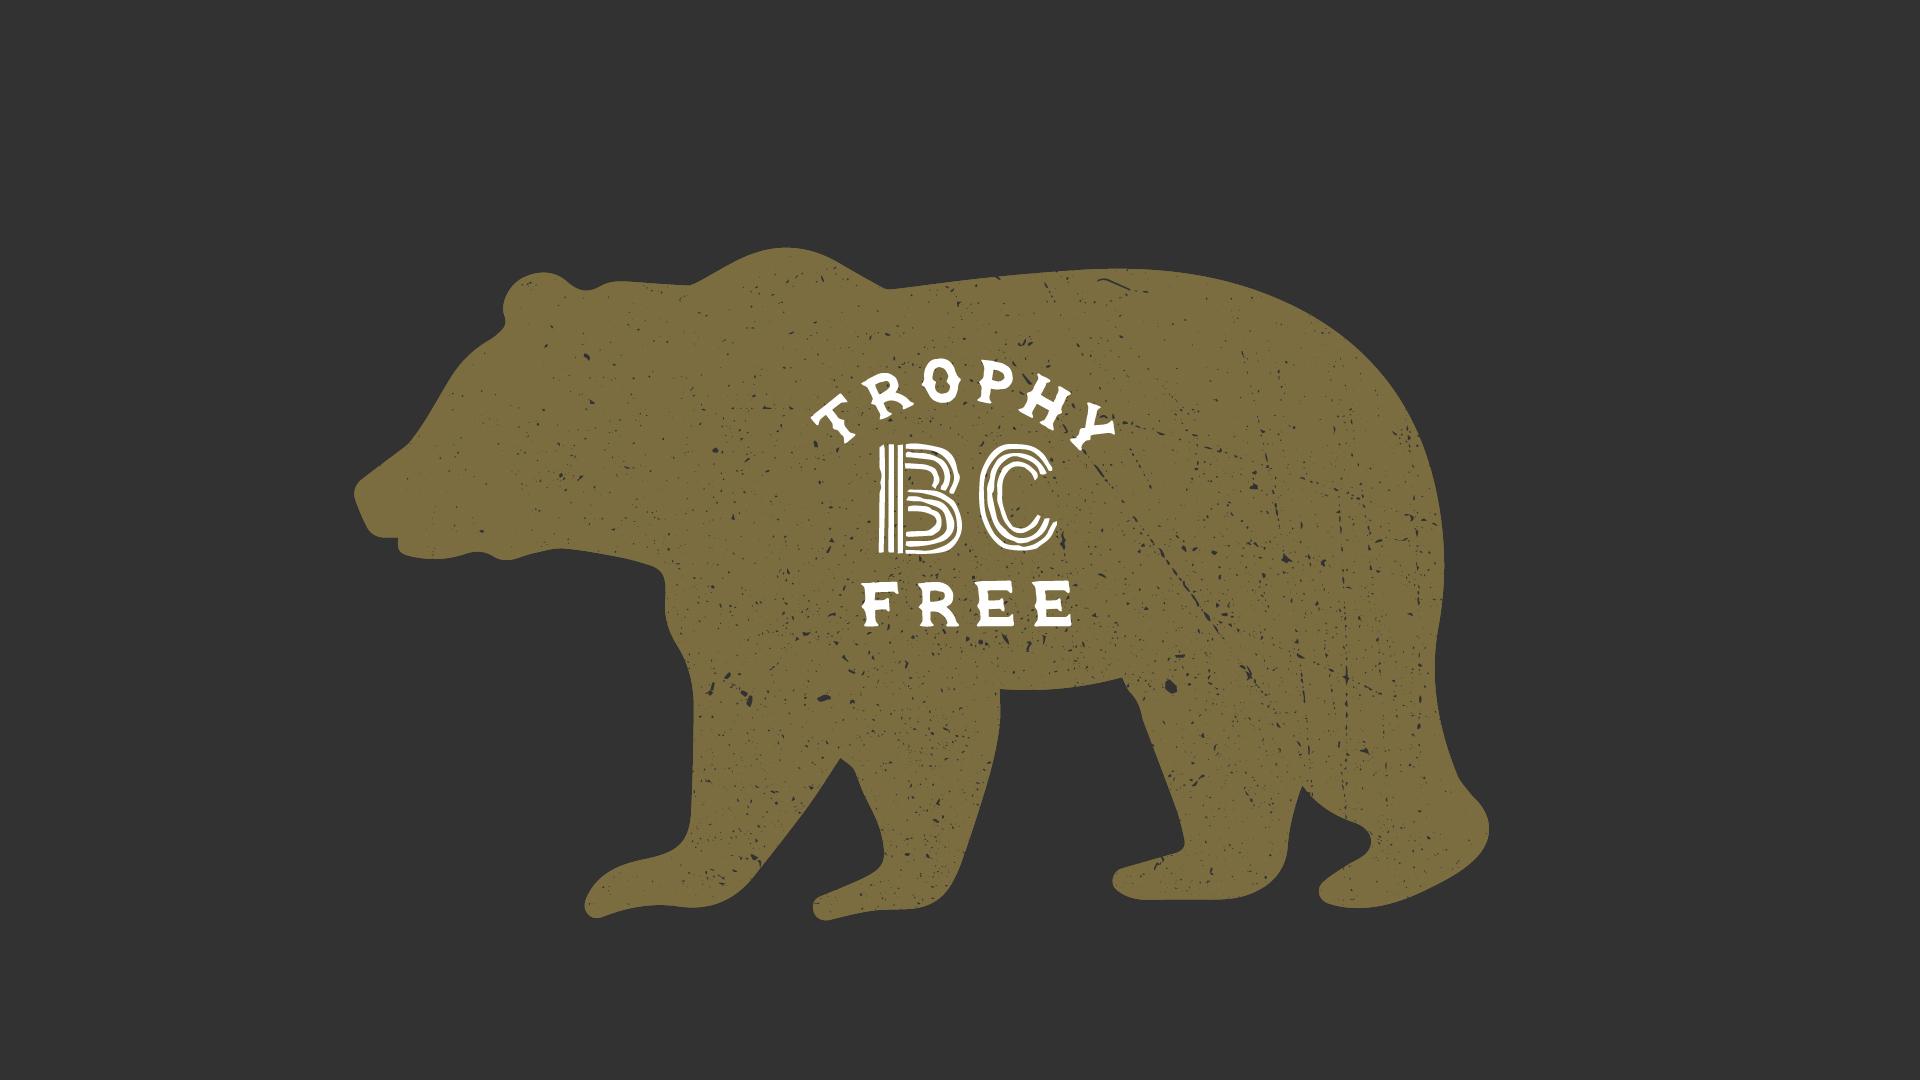 TrophyFreeBC_desktop.jpg